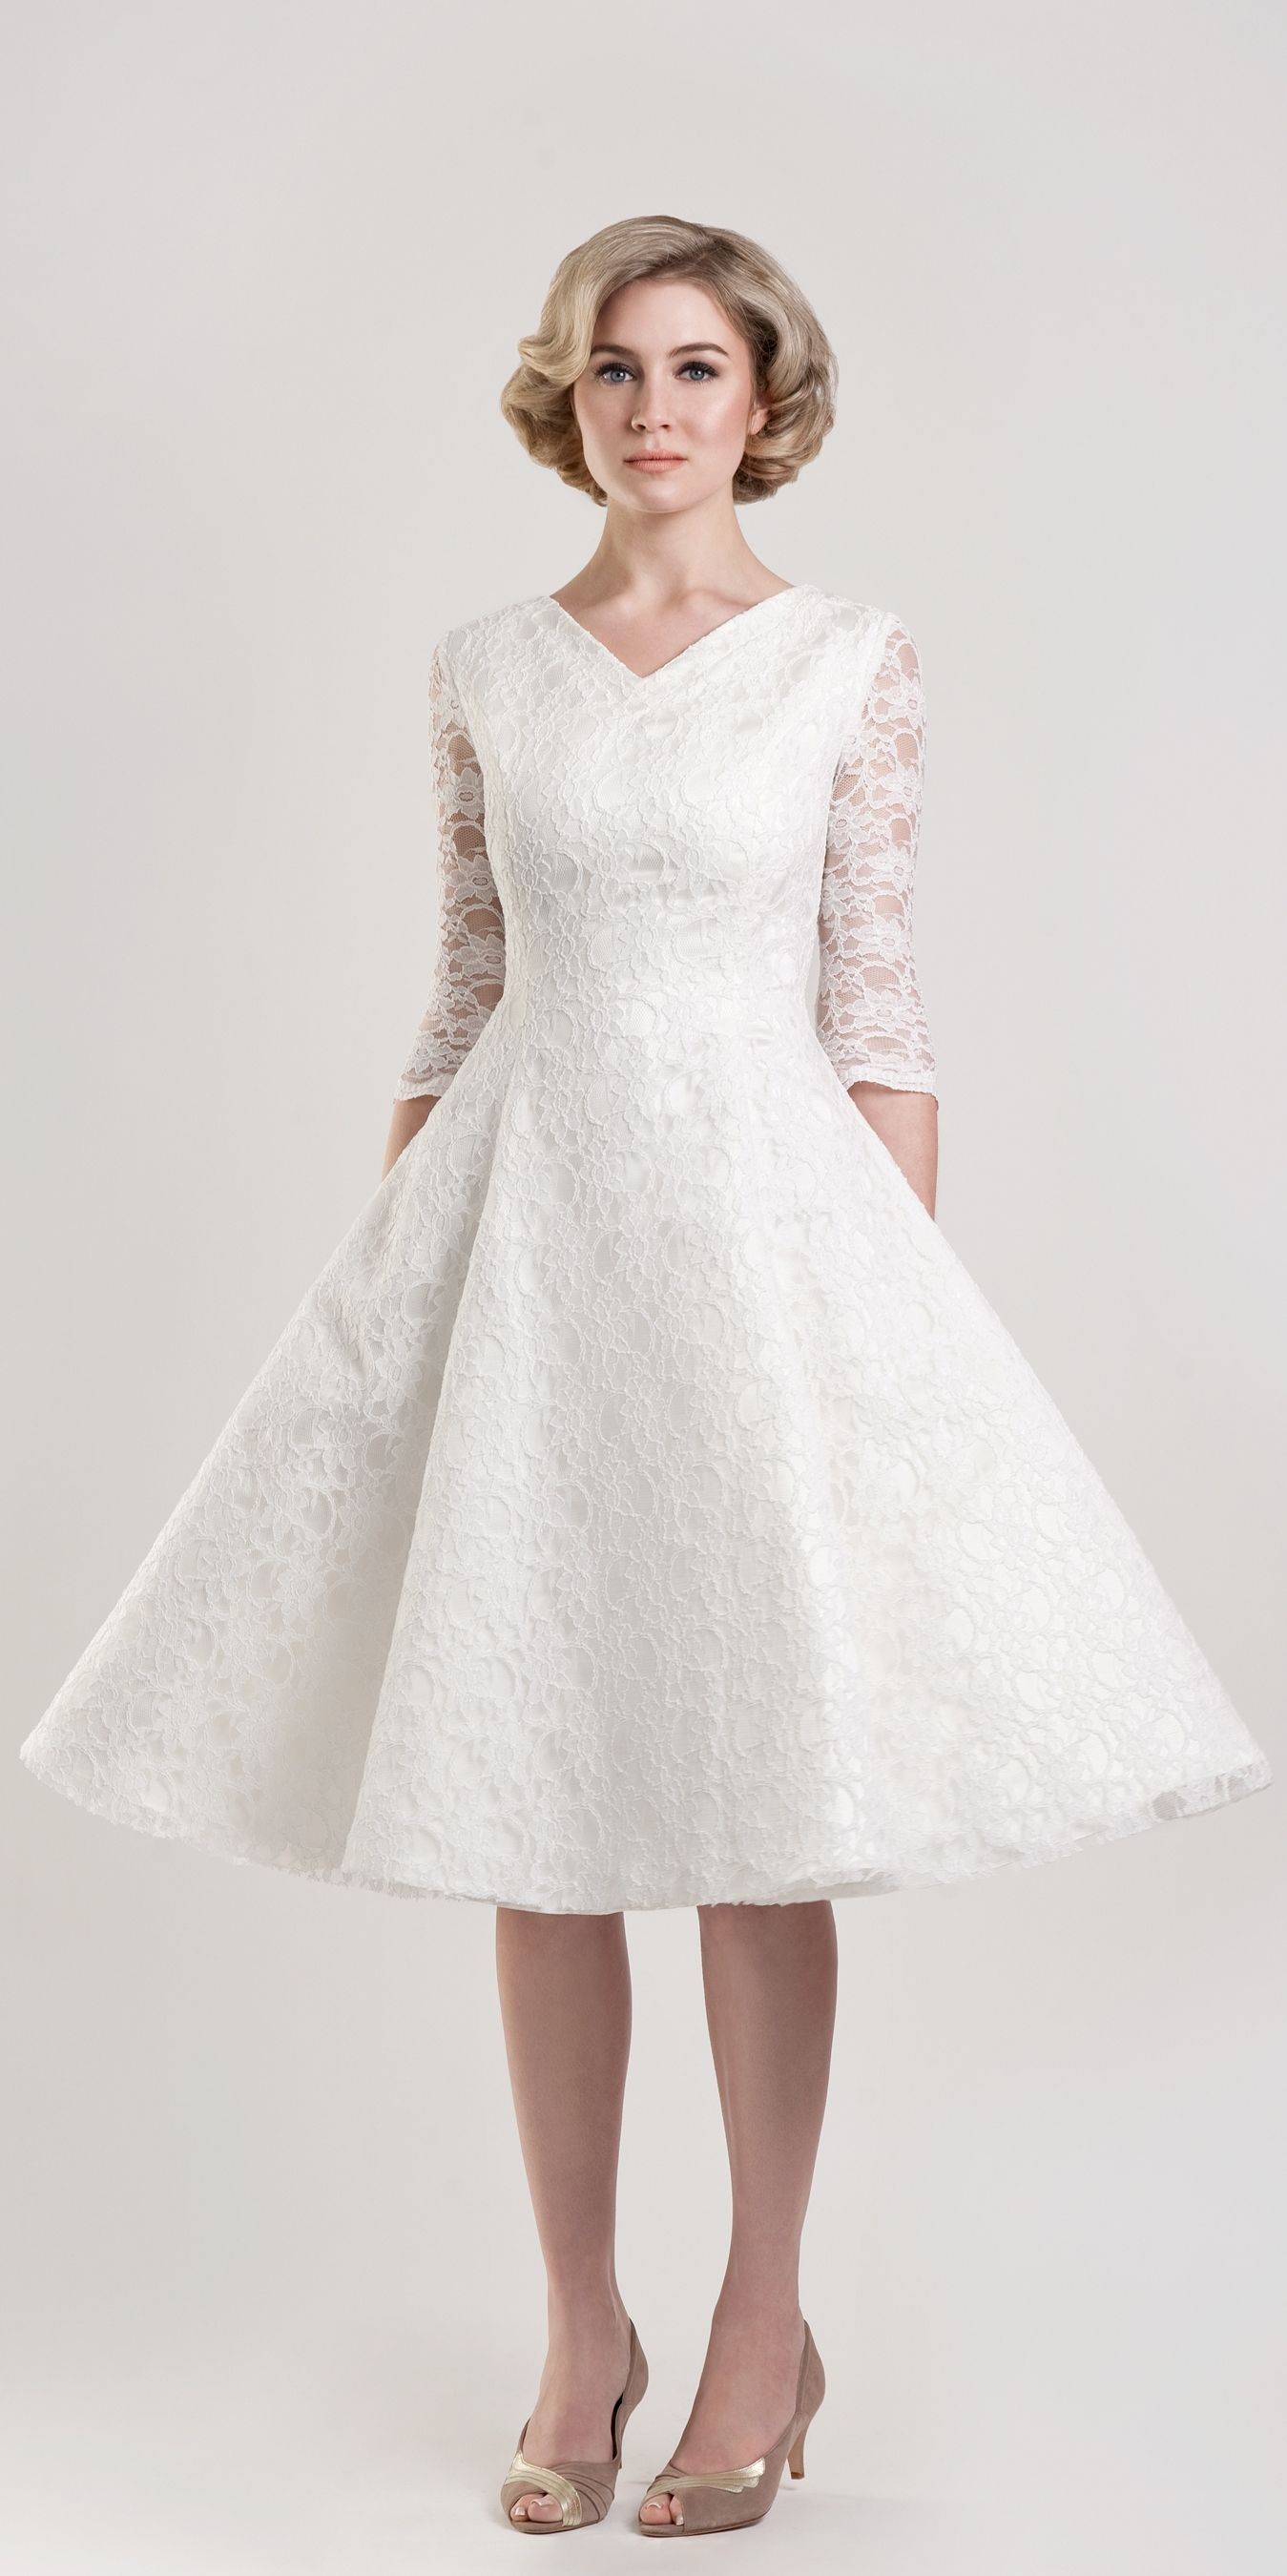 20 Tea Length Wedding Dresses Ideas